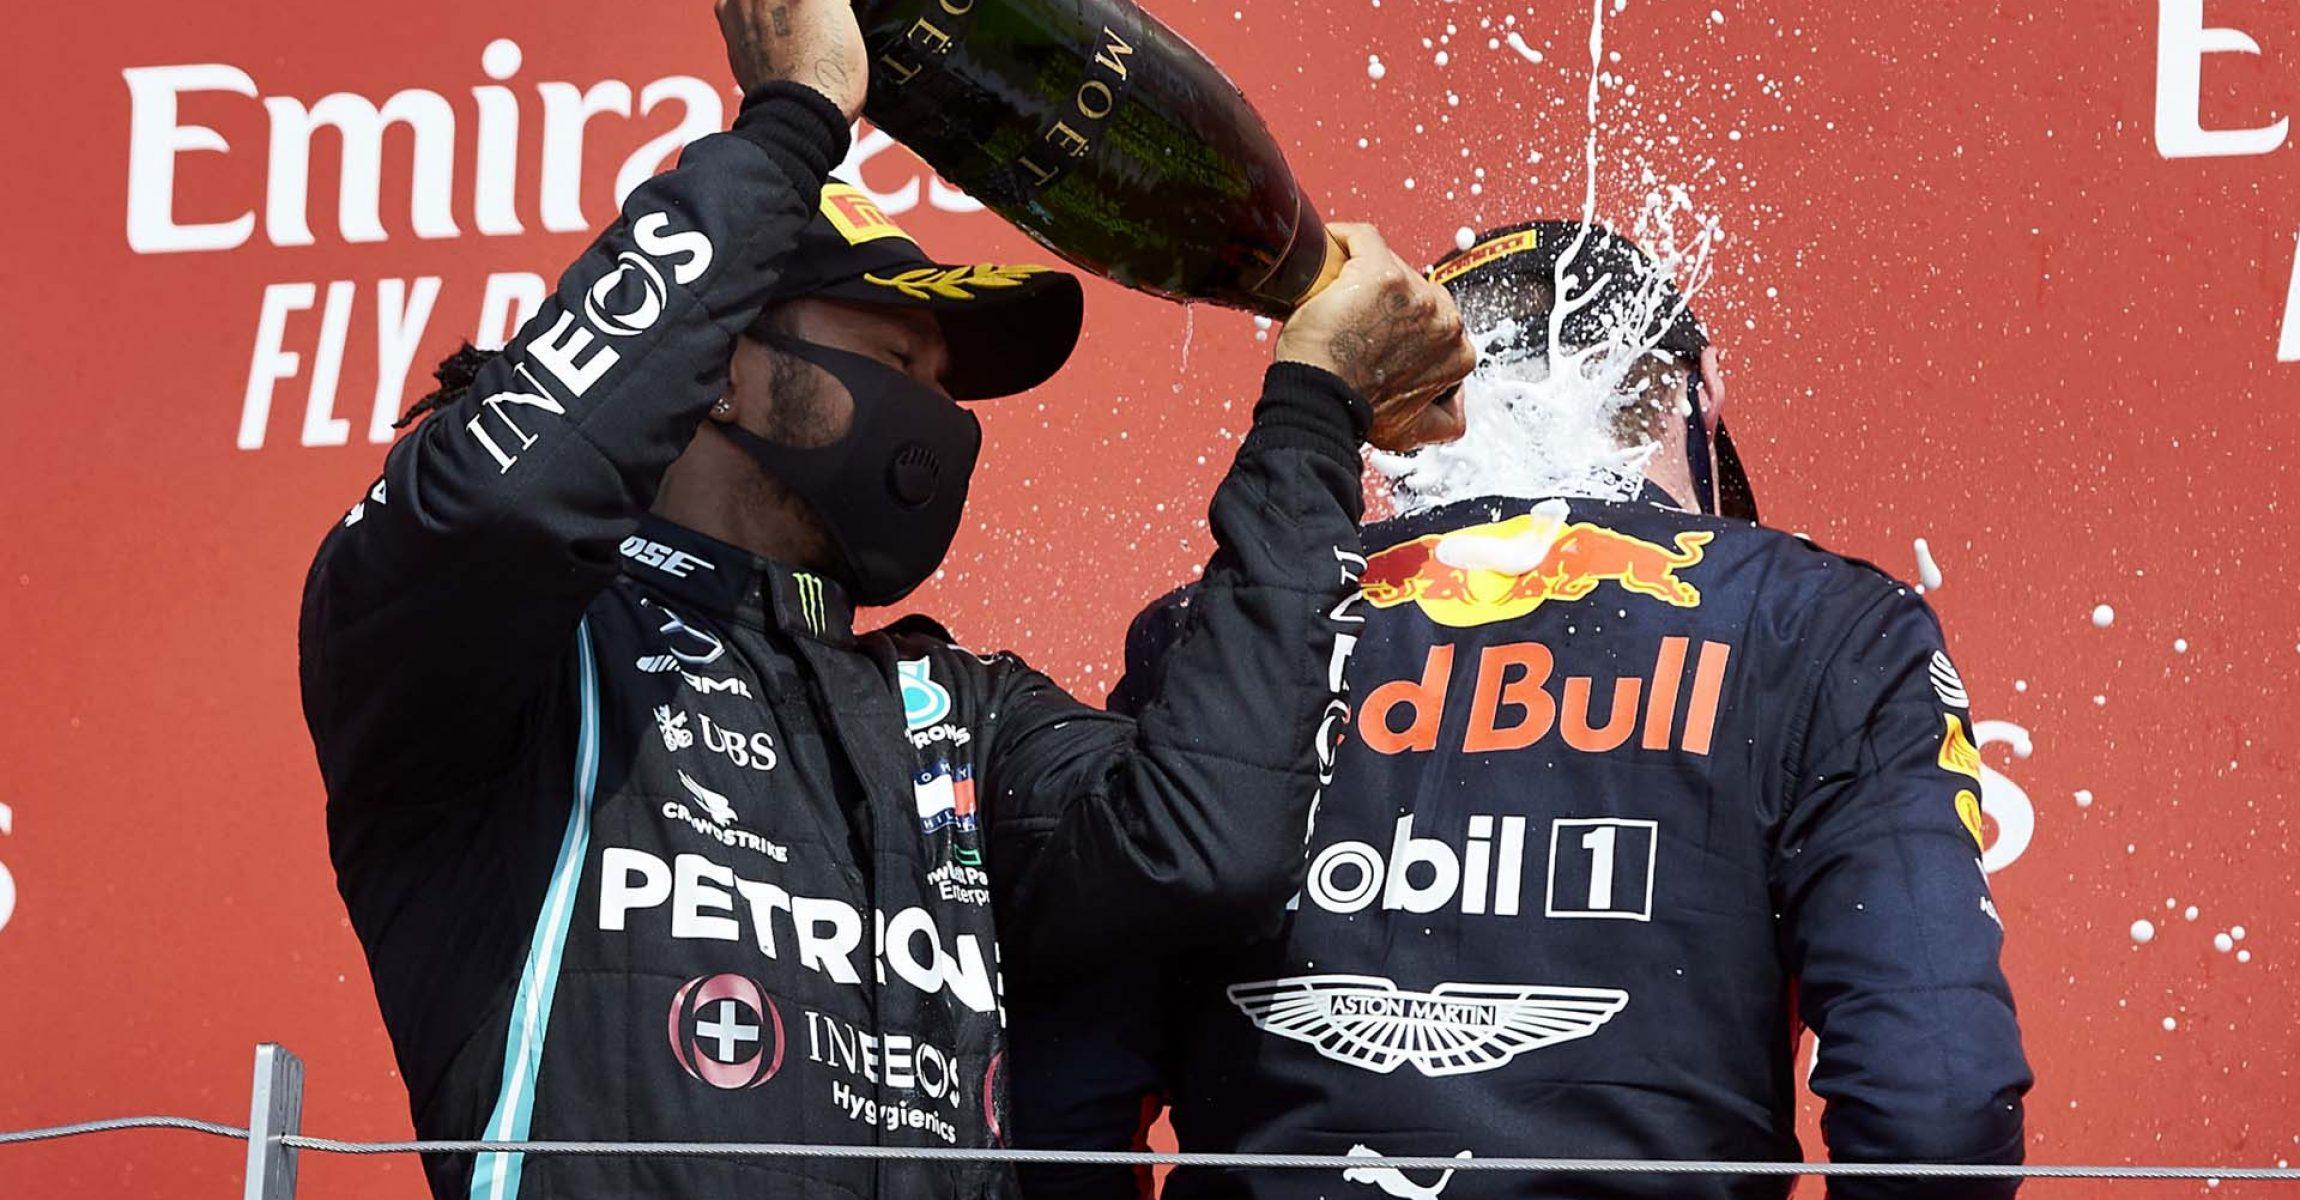 2020 70th Anniversary Grand Prix, Sunday - Steve Etherington Lewis Hamilton Mercedes Max Verstappen Red Bull